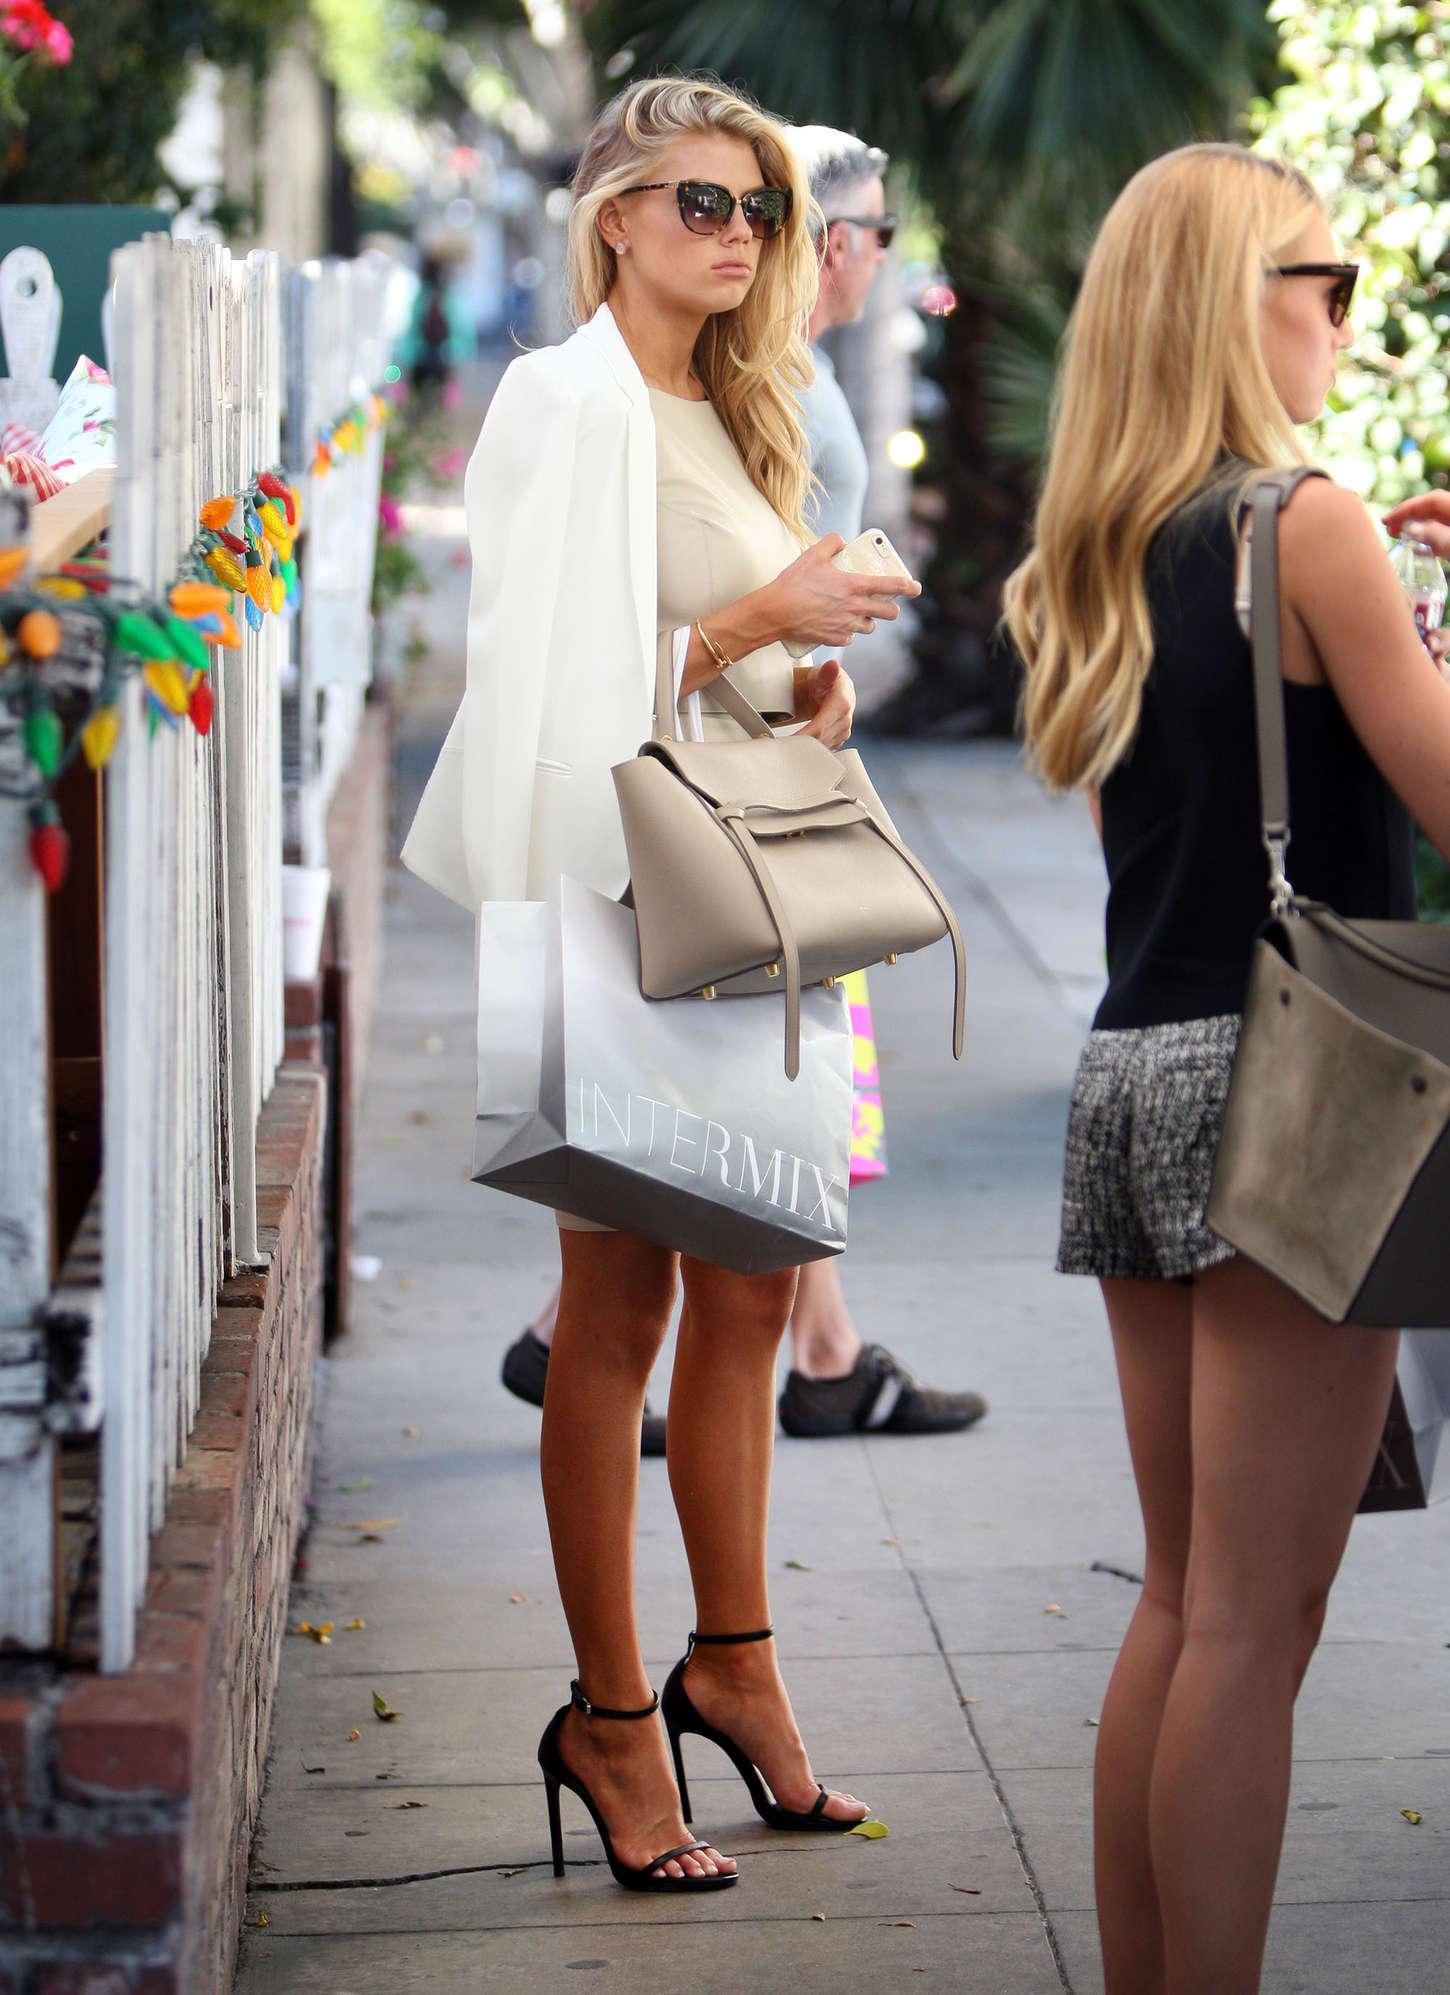 Charlotte McKinney at Intermix Clothing Store -20 - GotCeleb